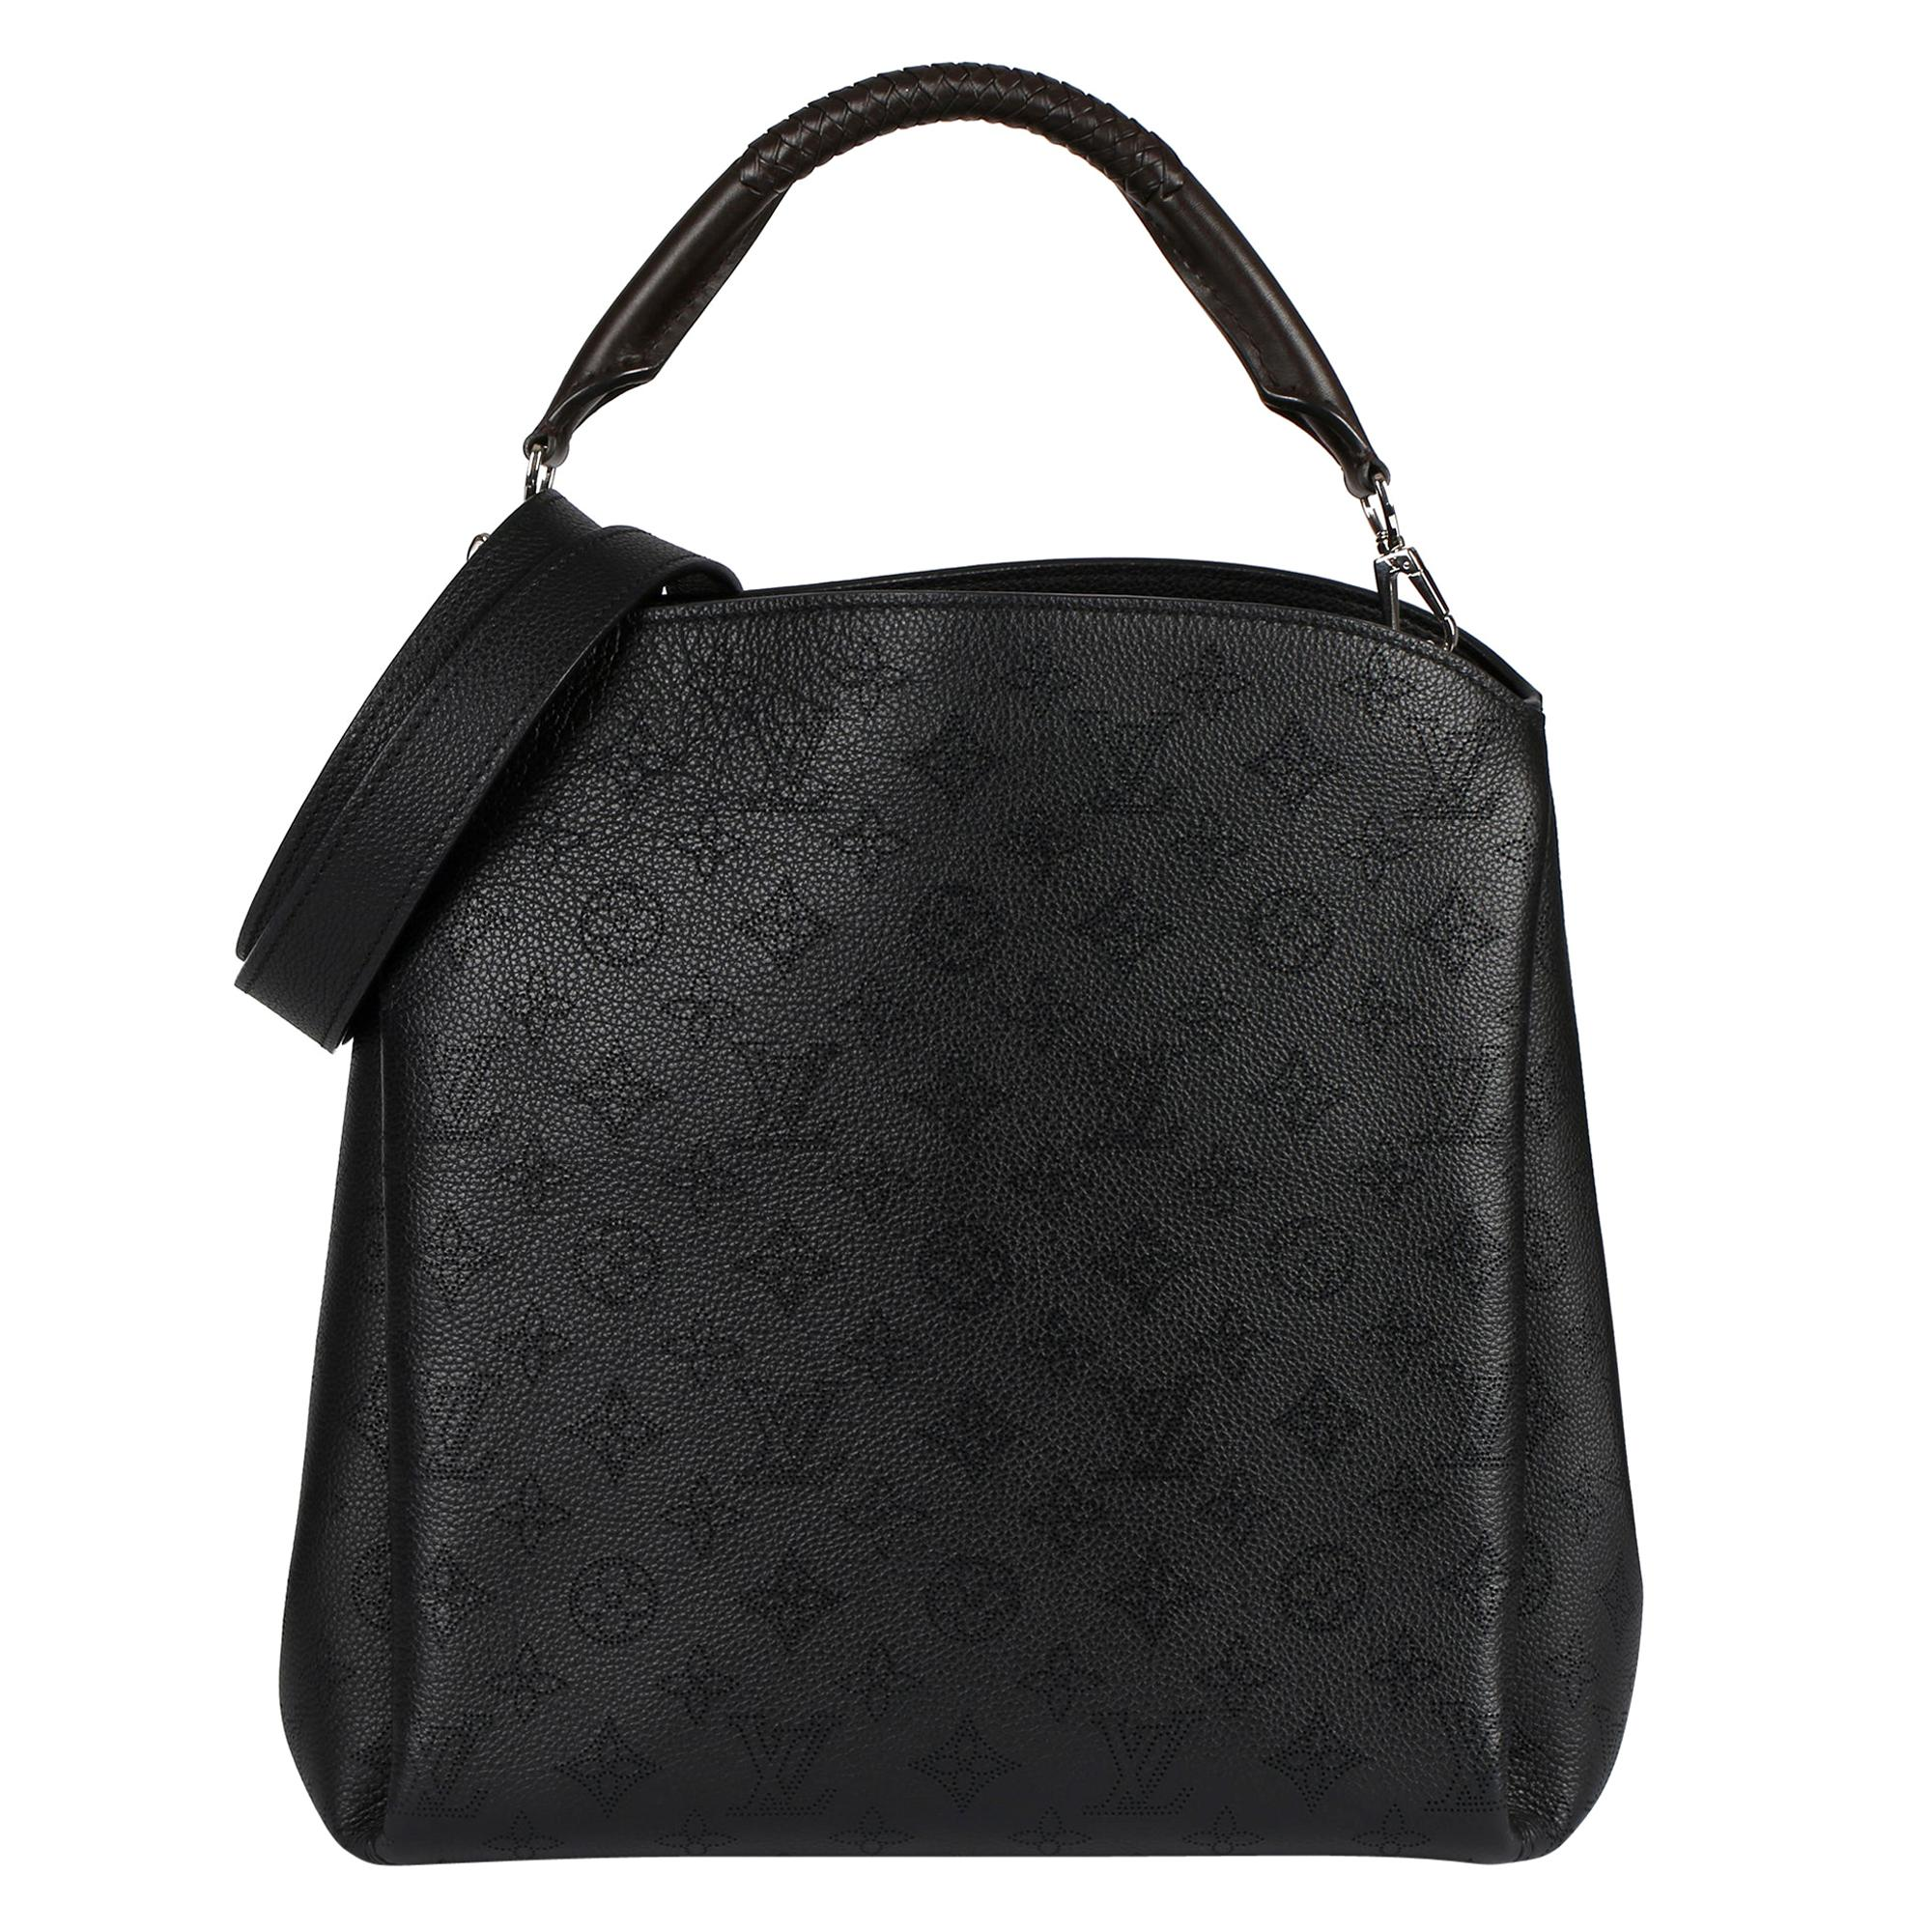 2016 Louis Vuitton Black Monogram Mahina Leather & Brown Leather Babylone MM